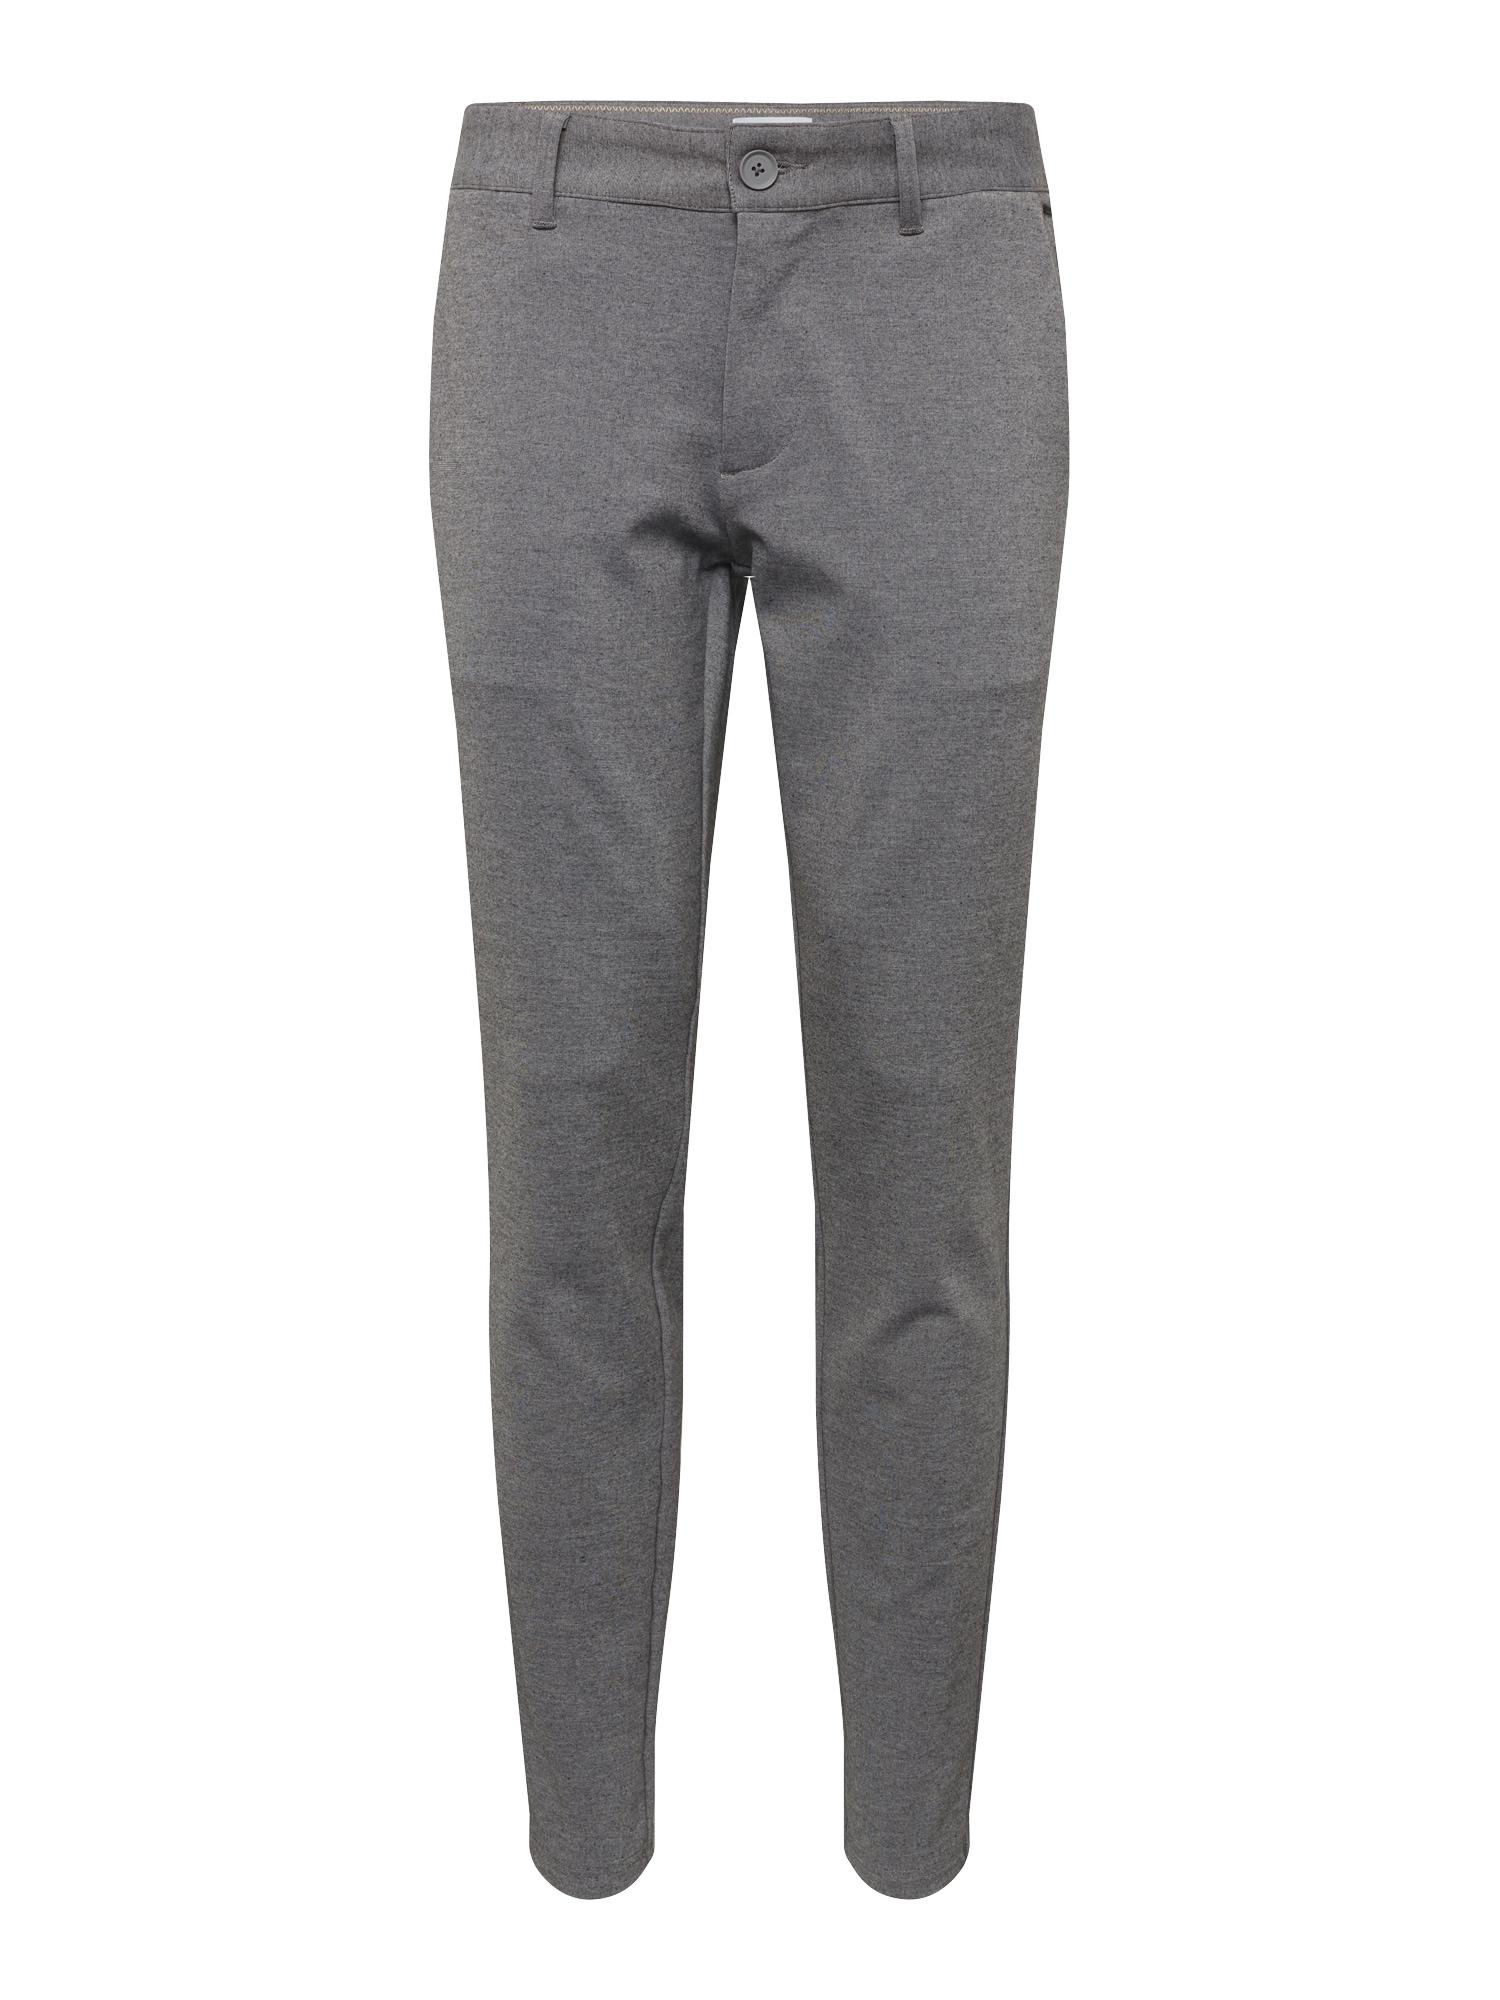 Chino kalhoty onsMARK PANT GW 0209 NOOS šedý melír Only & Sons